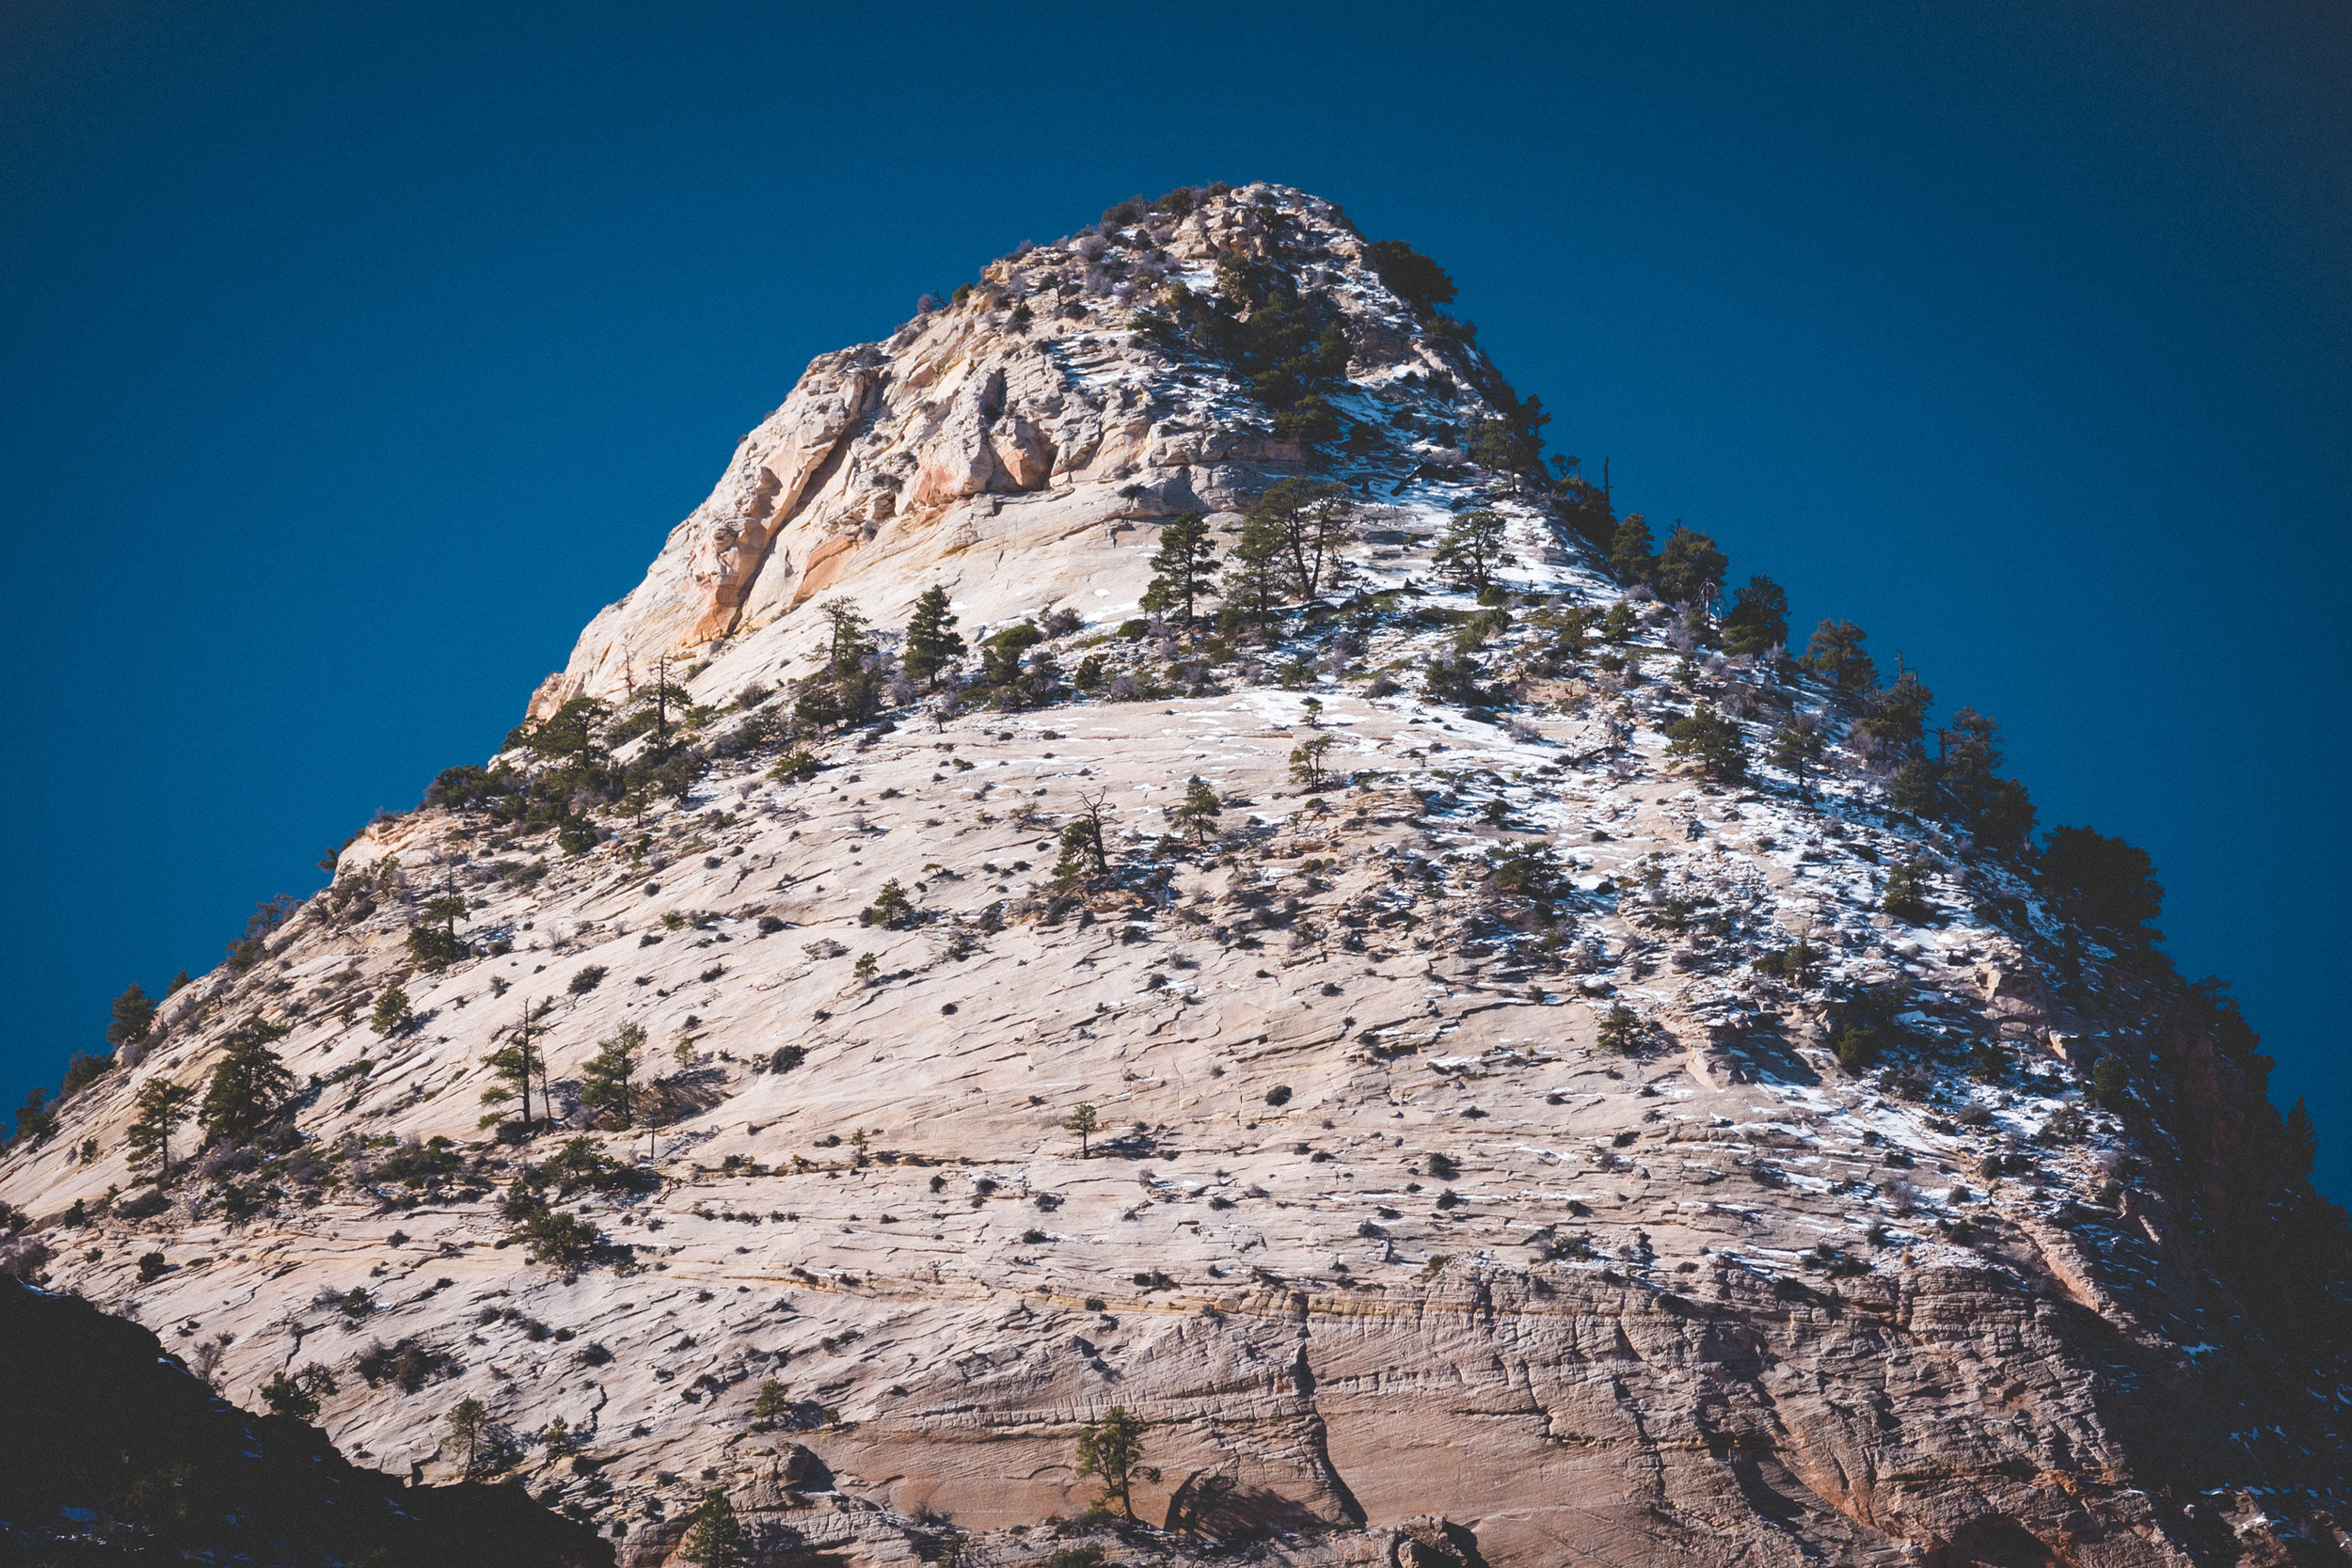 Zion-National-Park-64.jpg